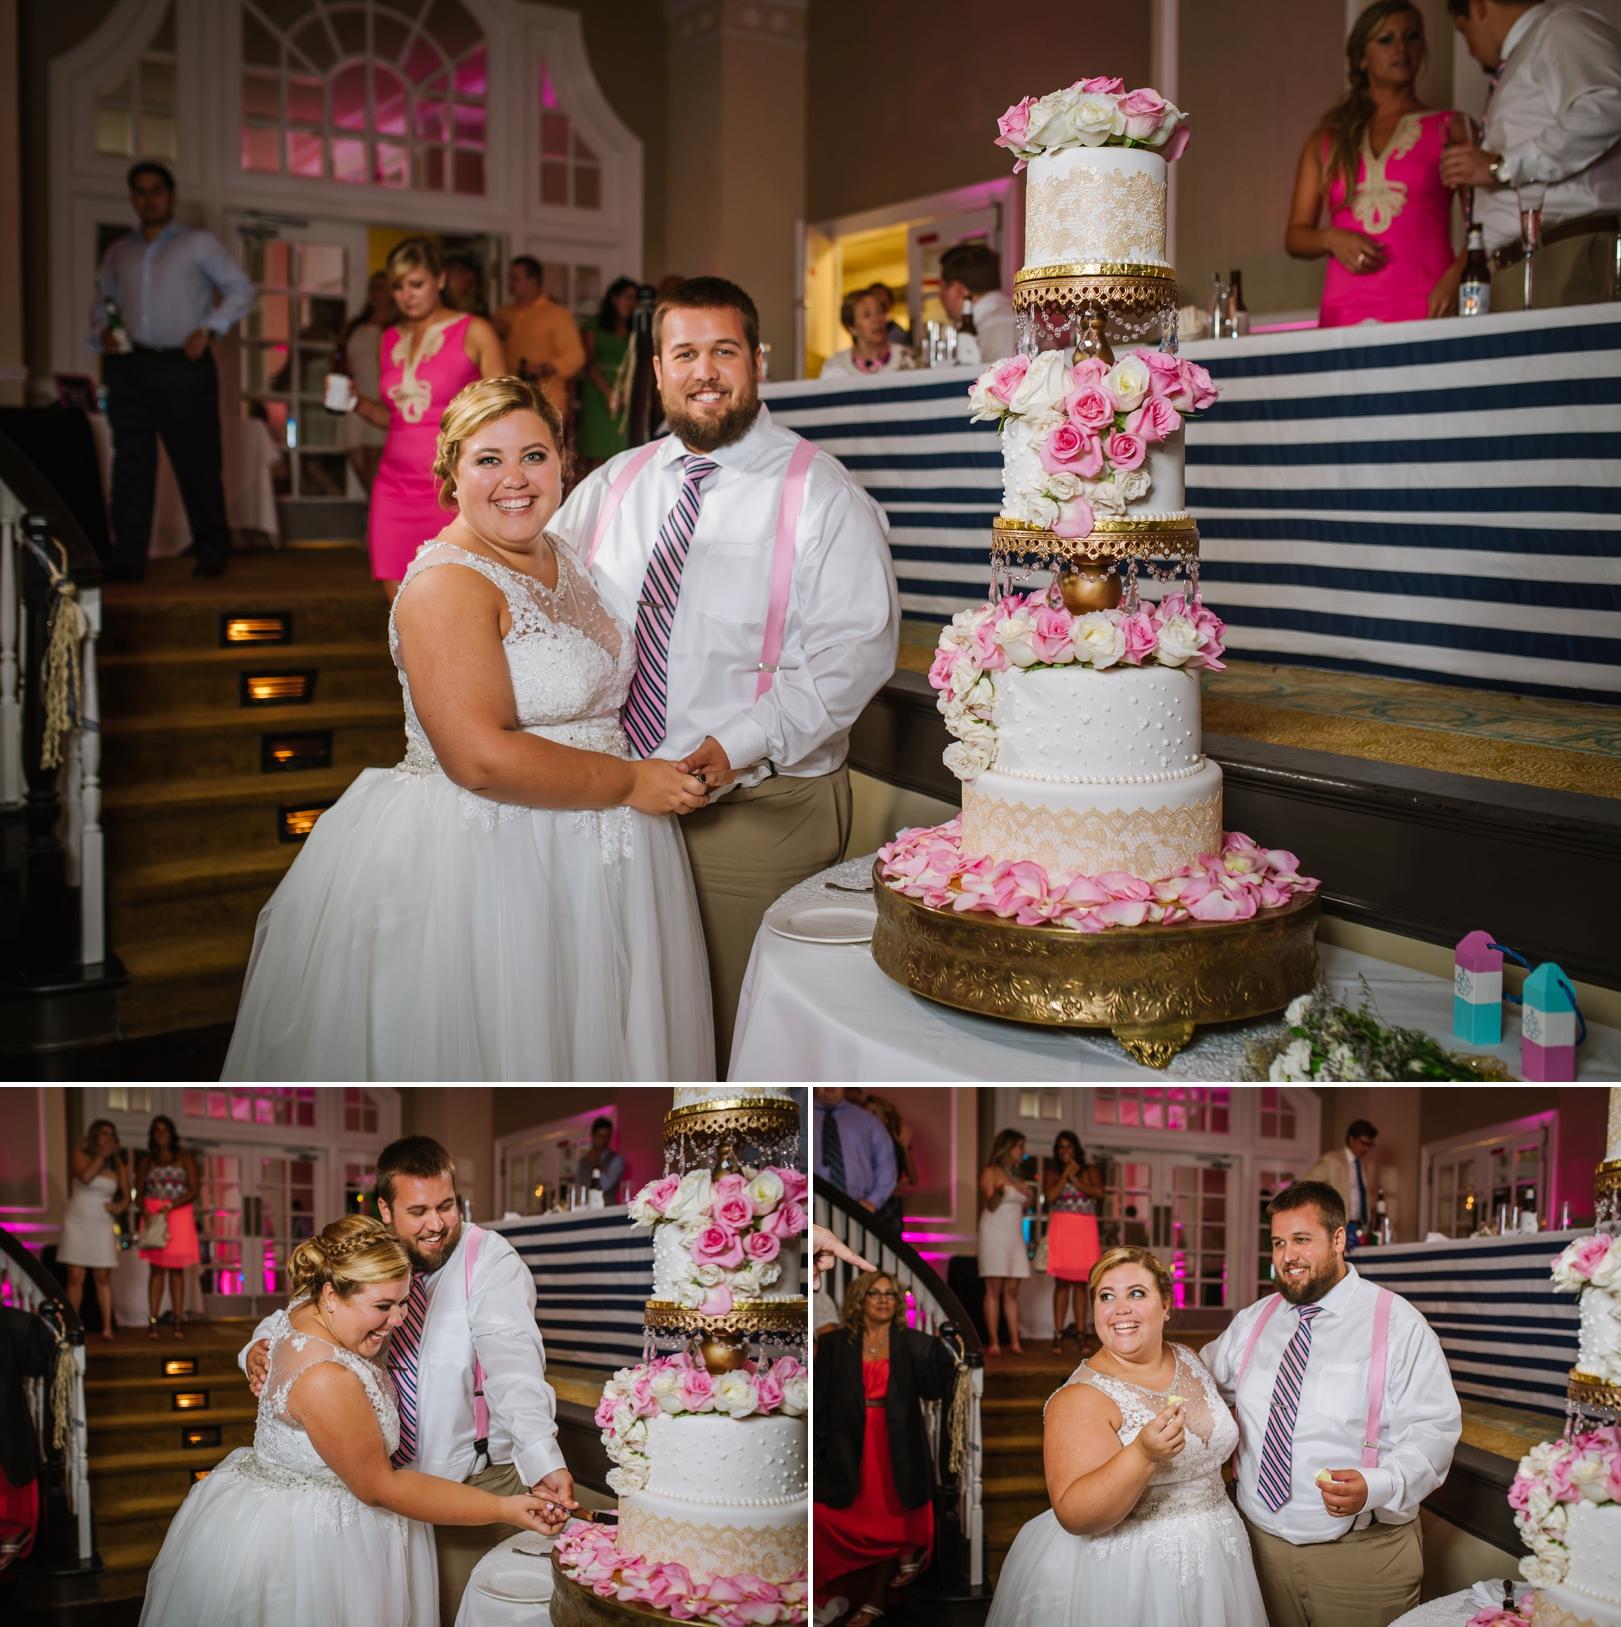 St-pete-wedding-photographer-don-caesar-ashlee-hamon_0033.jpg